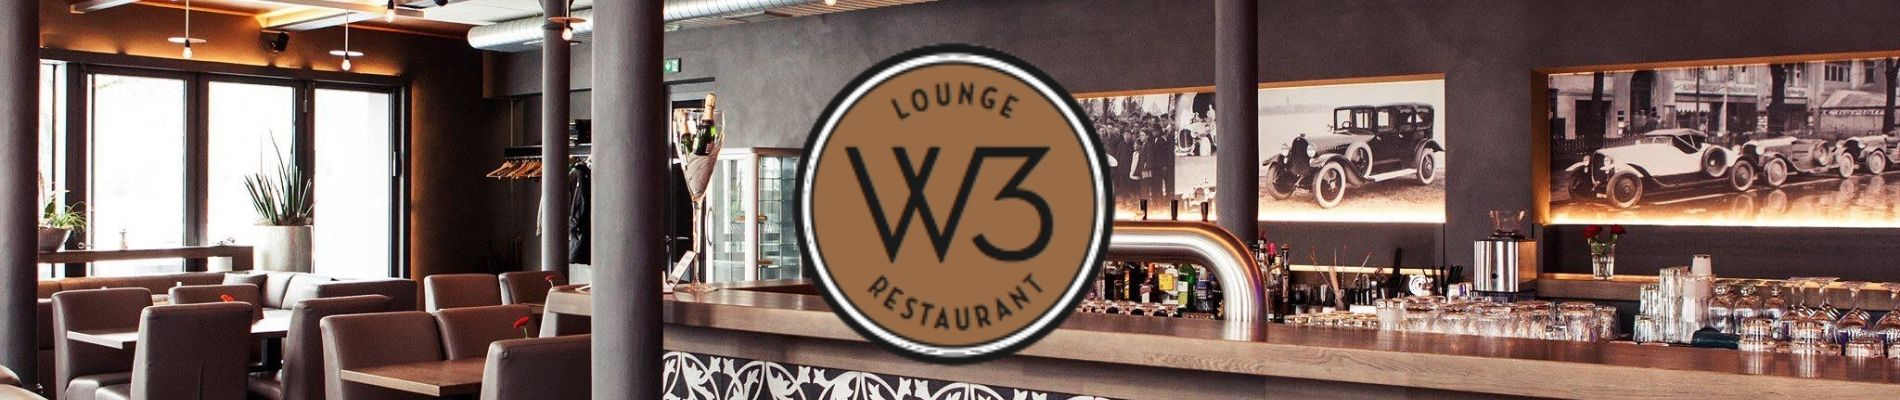 Restaurant Neumarkt Bar Lounge W3 Teaser